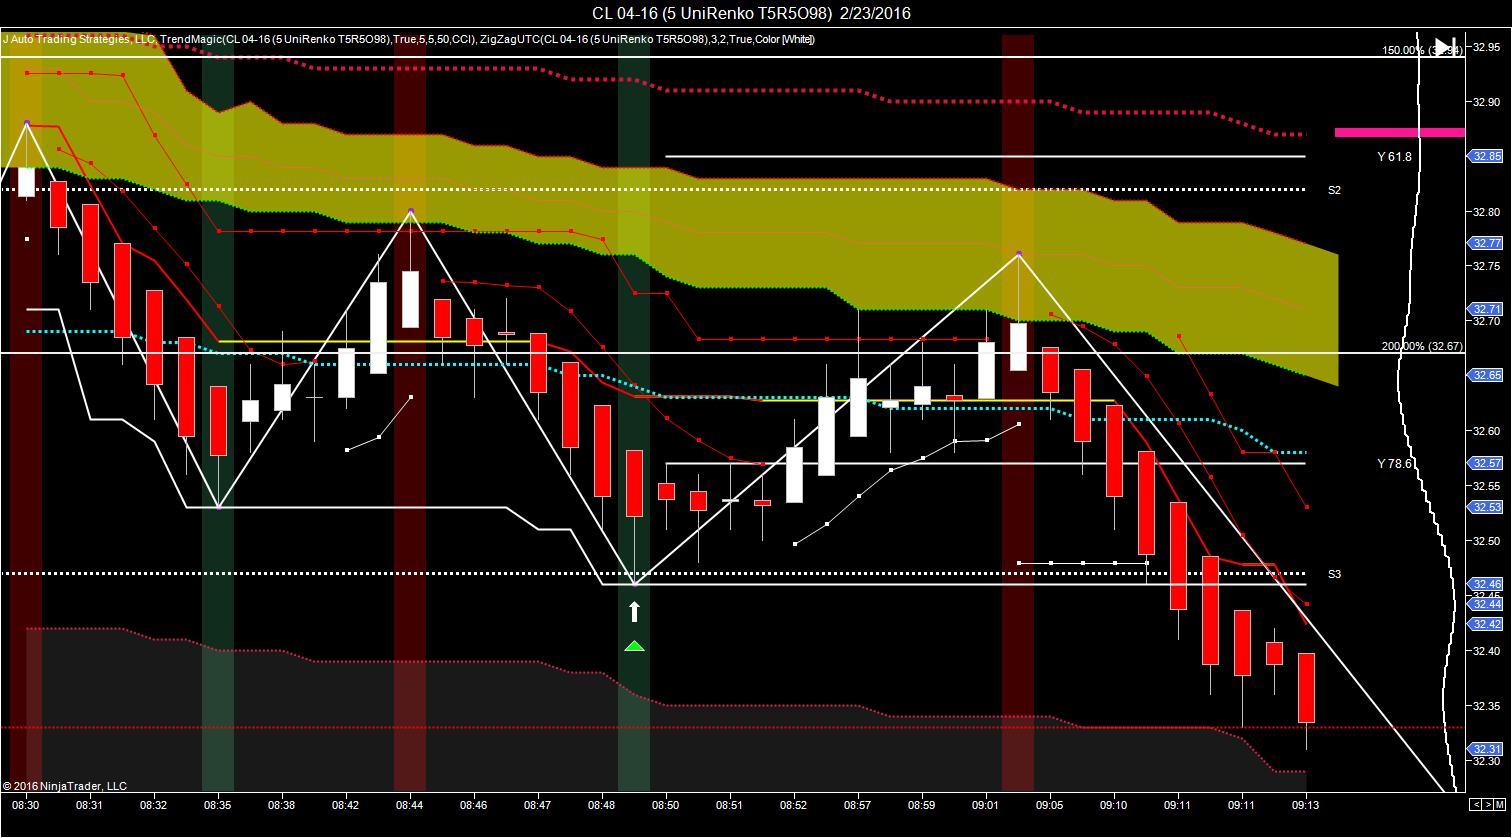 J auto trading strategies